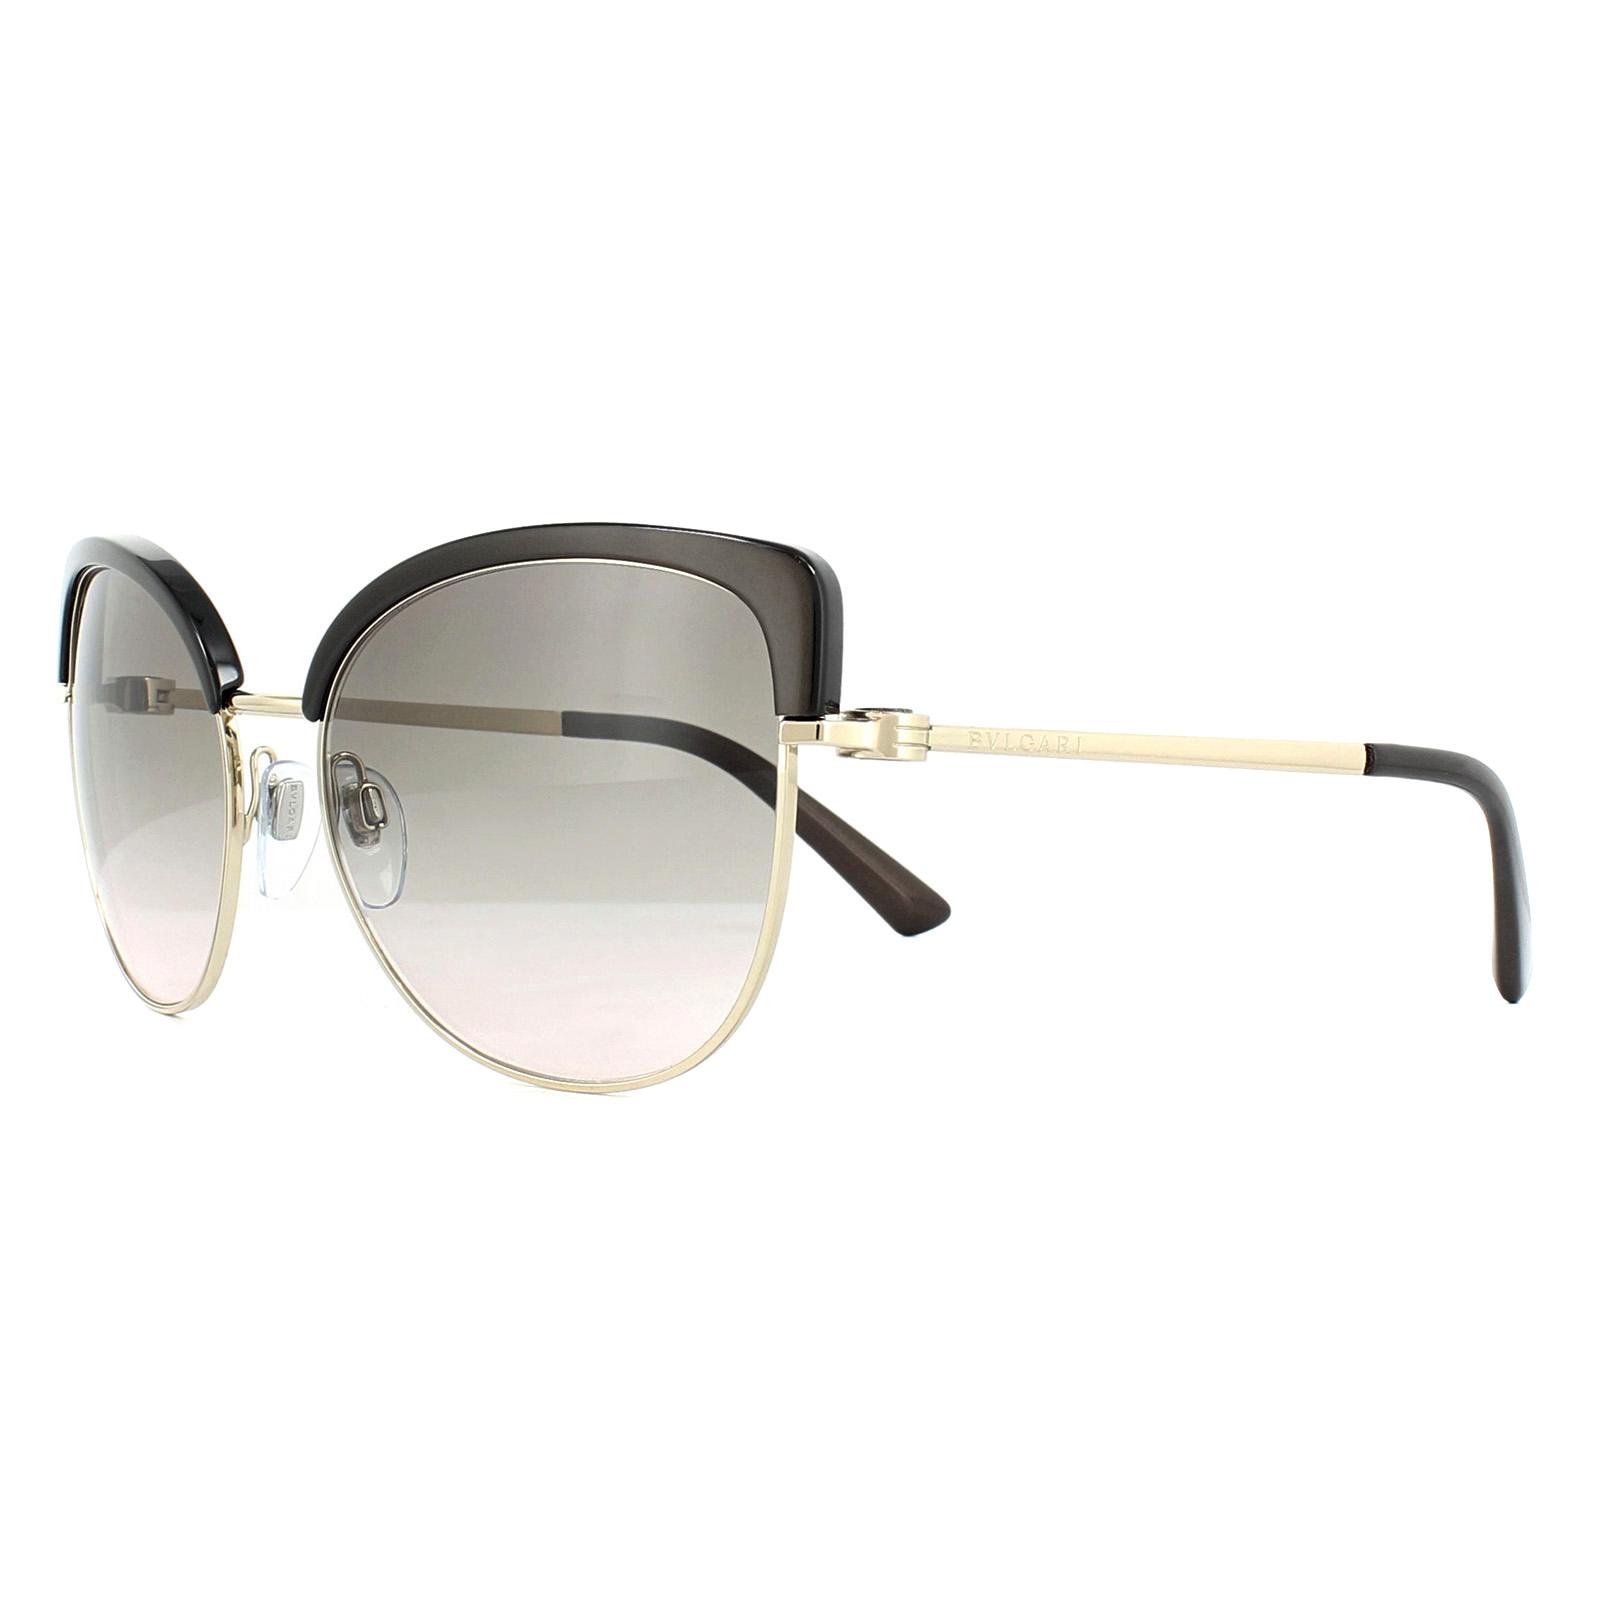 2b86dcd27f Sentinel Bvlgari Sunglasses 6082 278/3B Pale Gold Cocoa Pink Gradient Grey